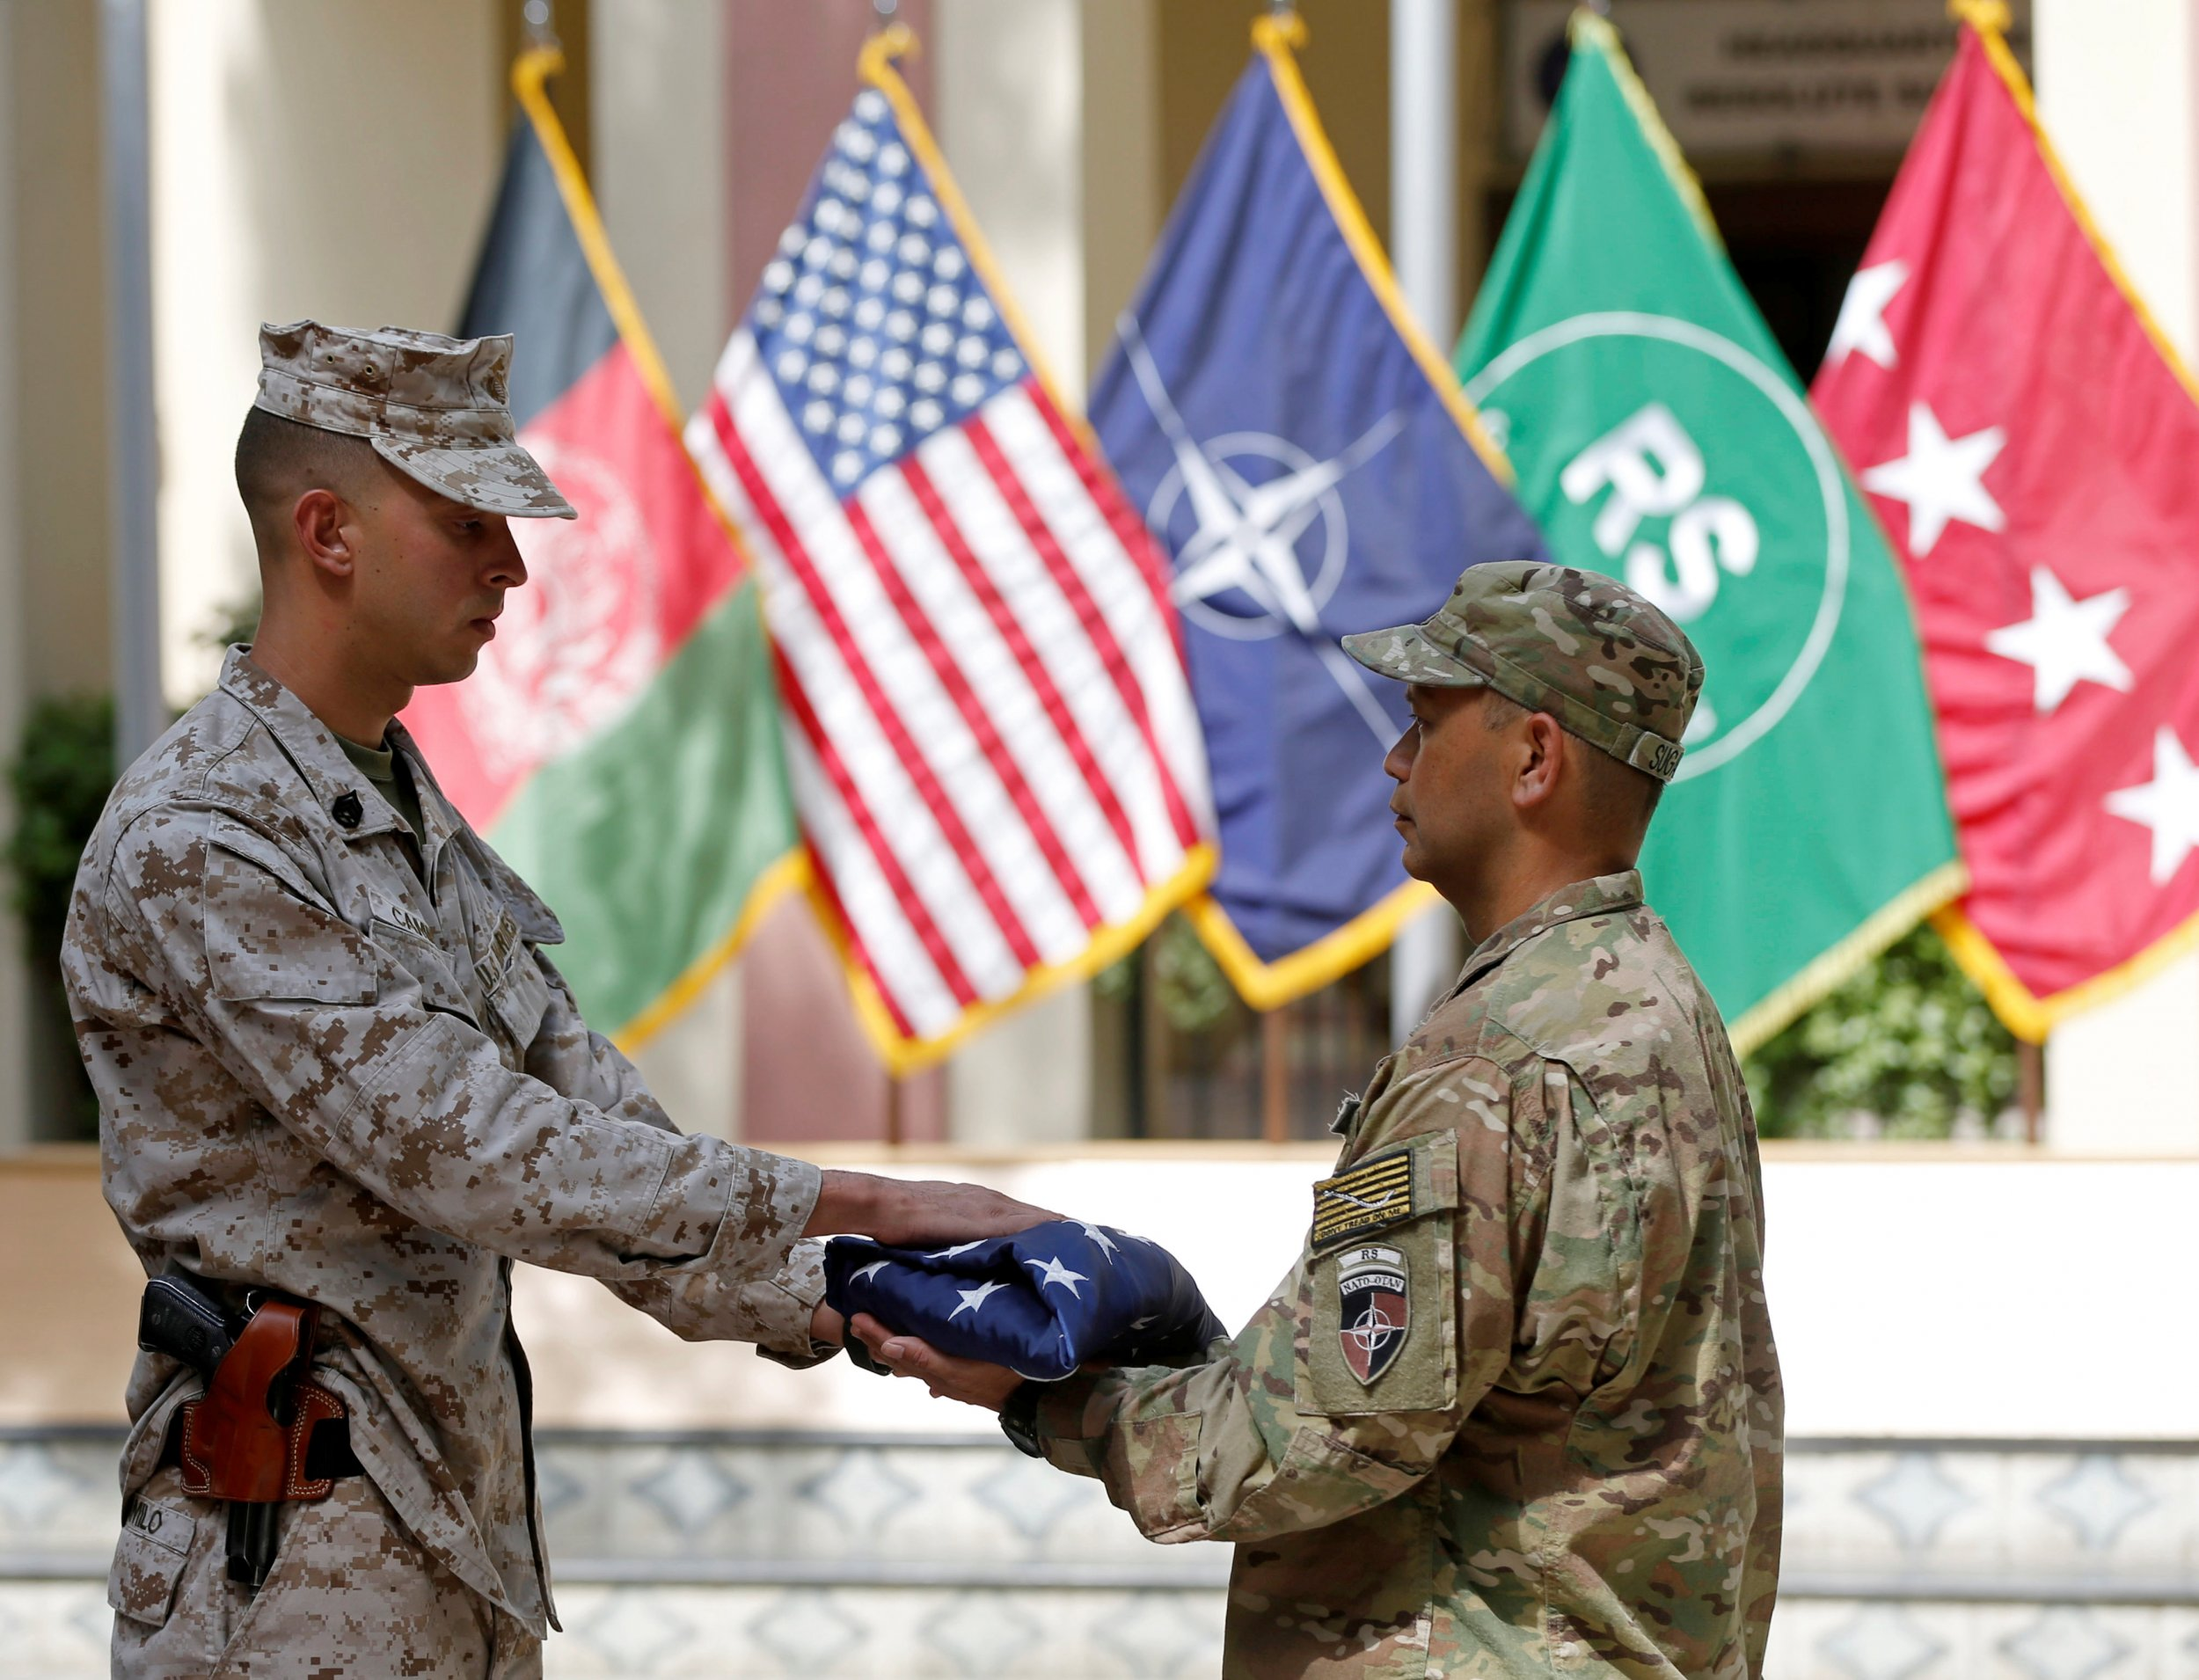 09_16_Afghanistan_01